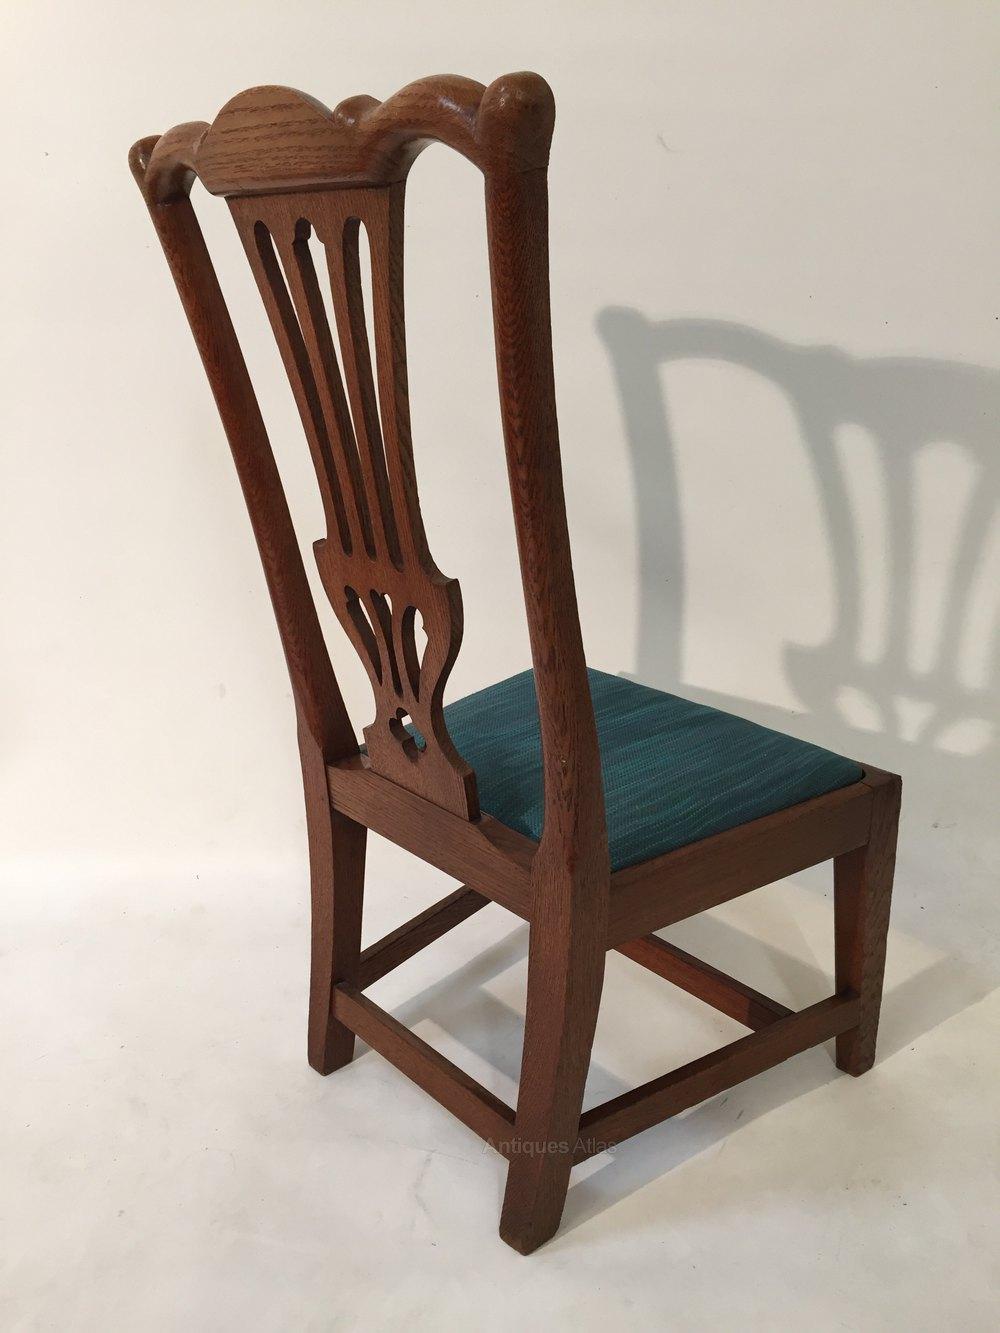 wheeler arncroach gossip chair  antiques atlas - photos wheeler arncroach gossip chair